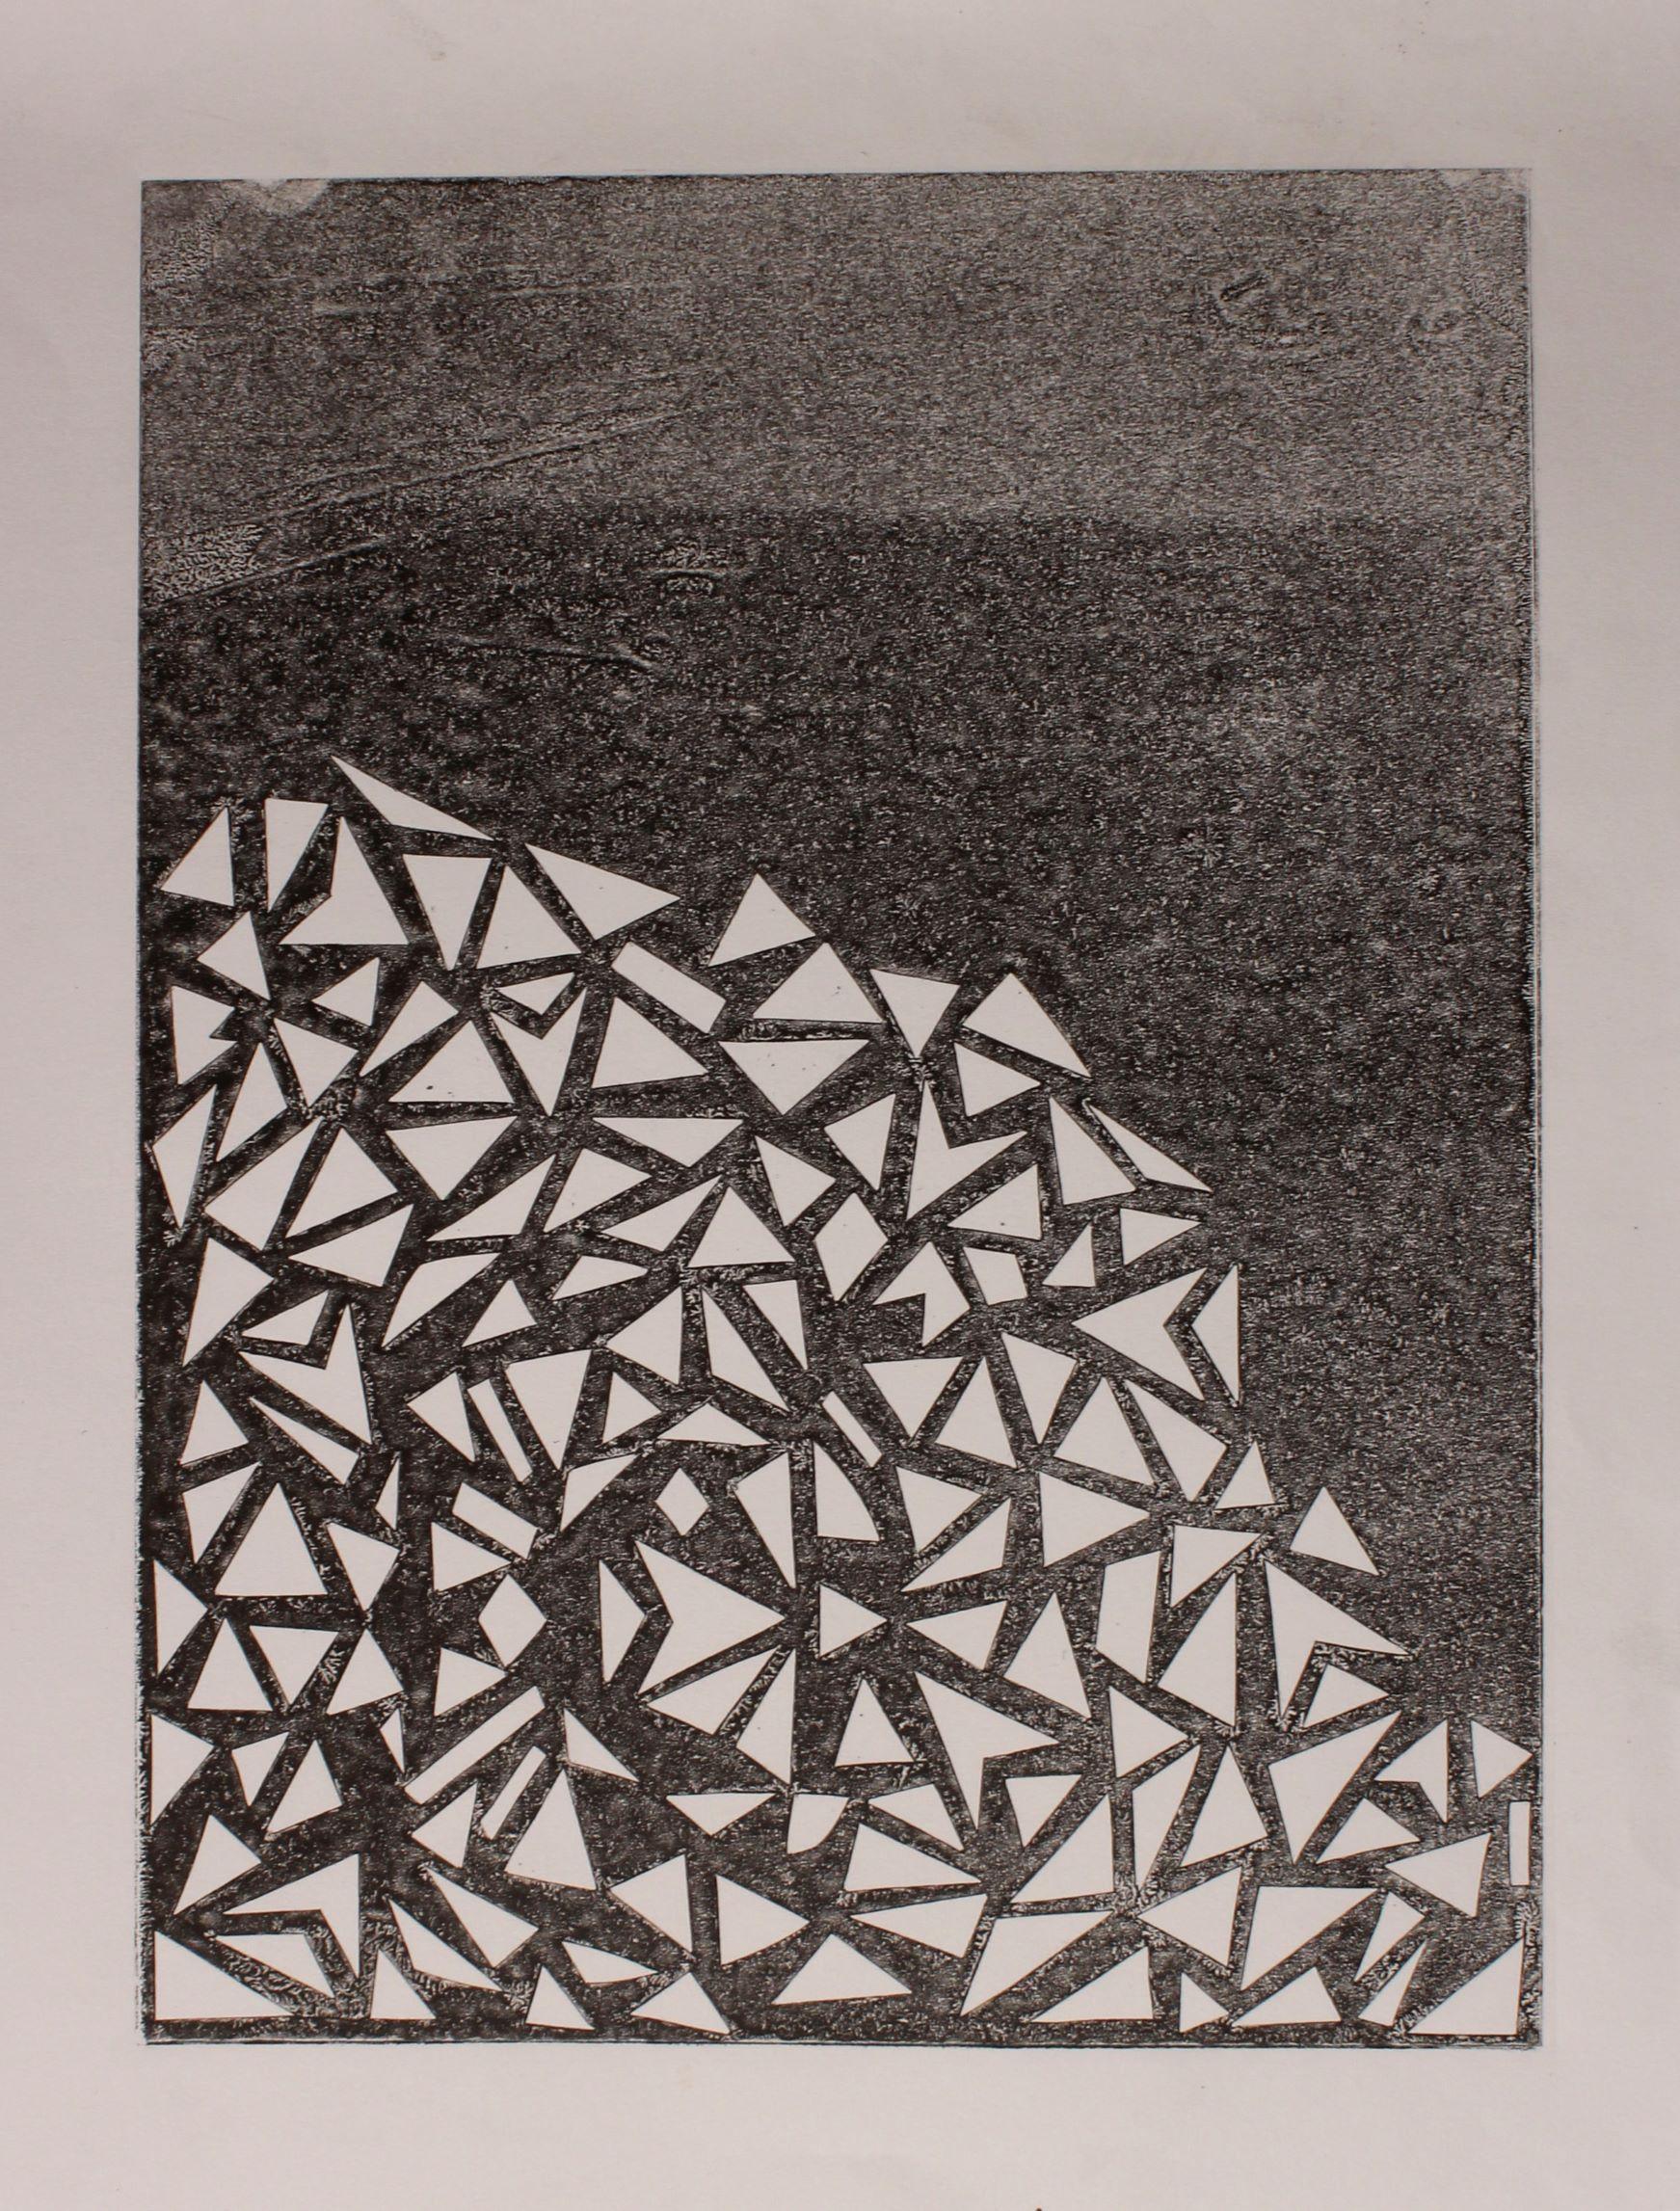 Triangle Print 03, 2017